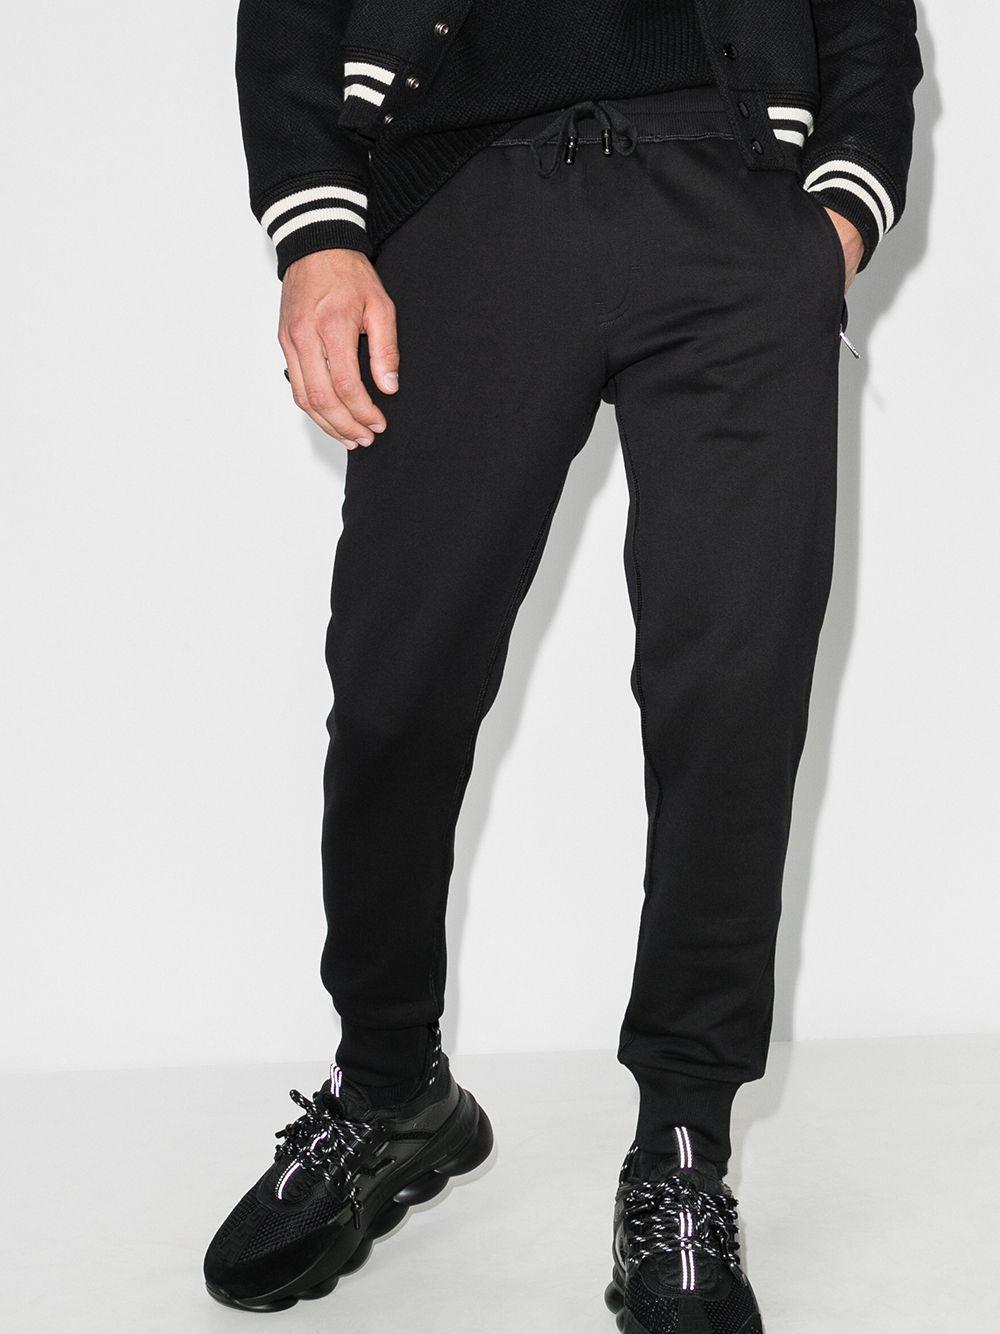 black cotton slim-fit track pants with back Dolce & Gabbana logo DOLCE & GABBANA |  | GYWDAT-FU7DUN0000